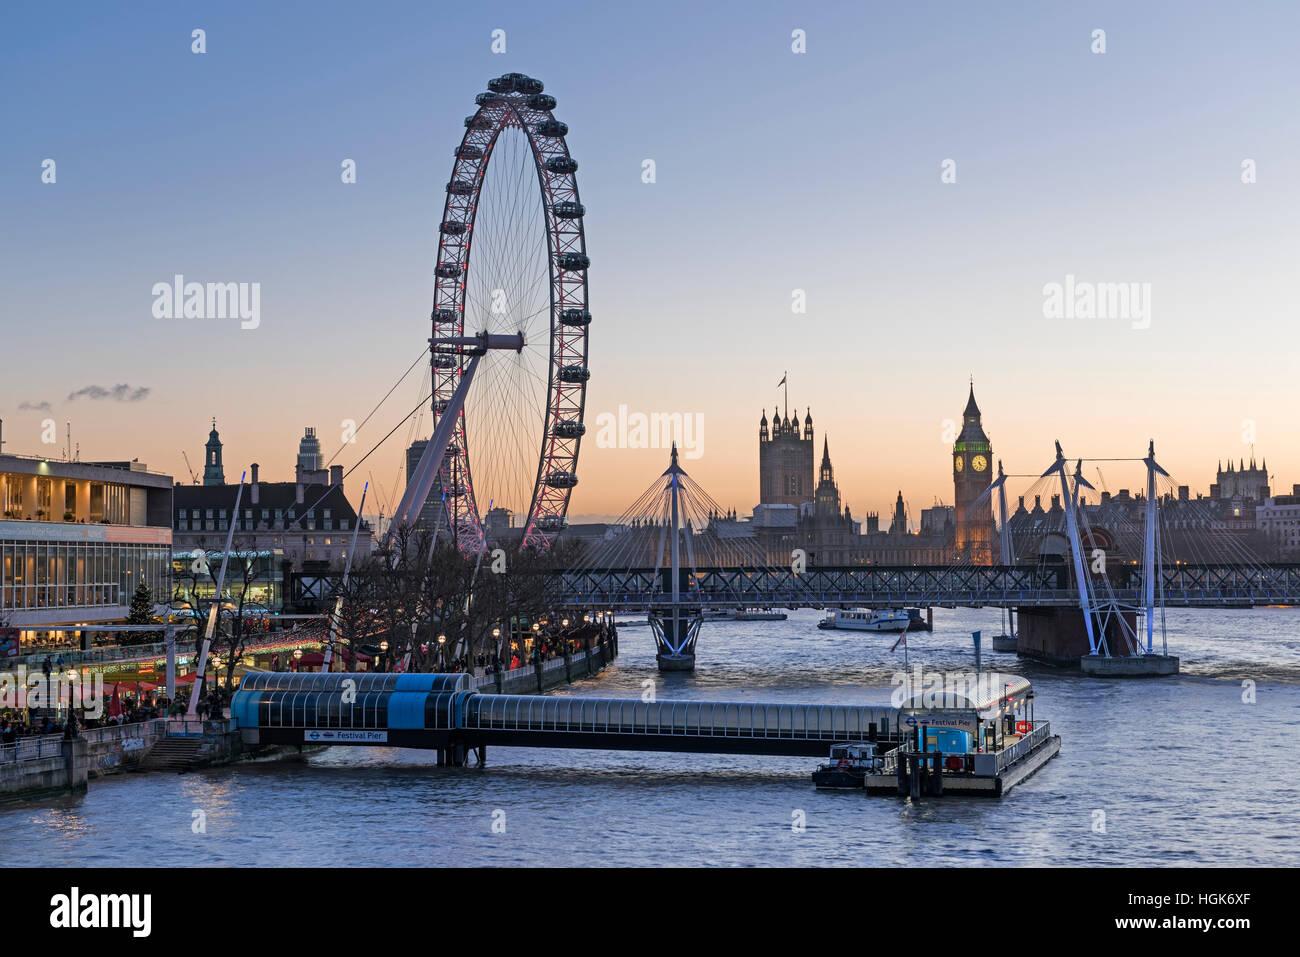 River view. London Eye and Big Ben. Southbank London UK Stock Photo